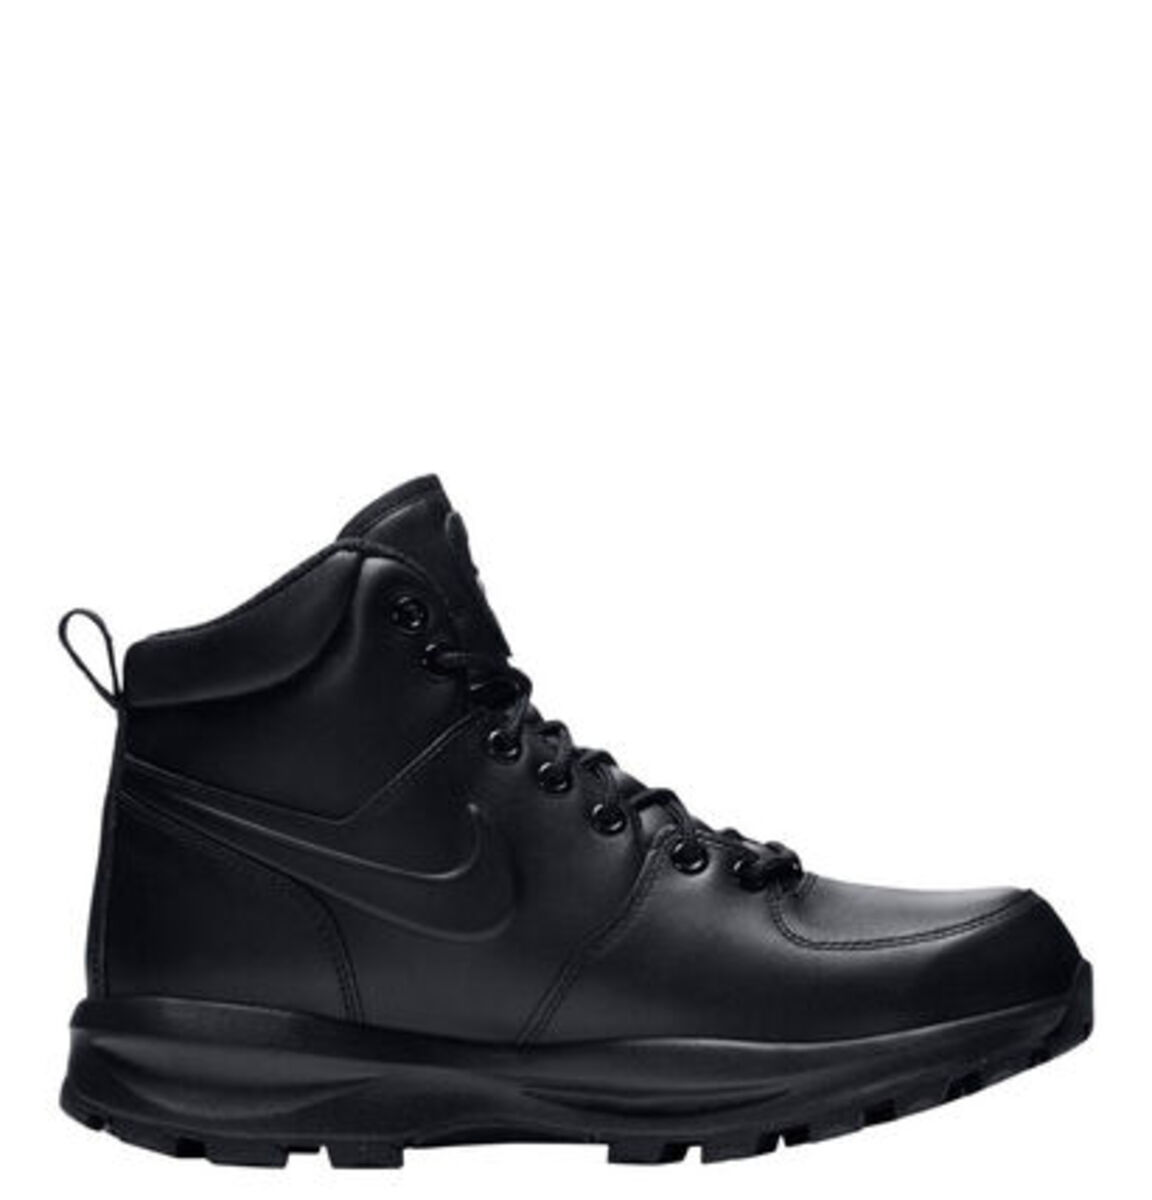 Bild 1 von Nike Herren Boots Manoa, schwarz, 41, 41